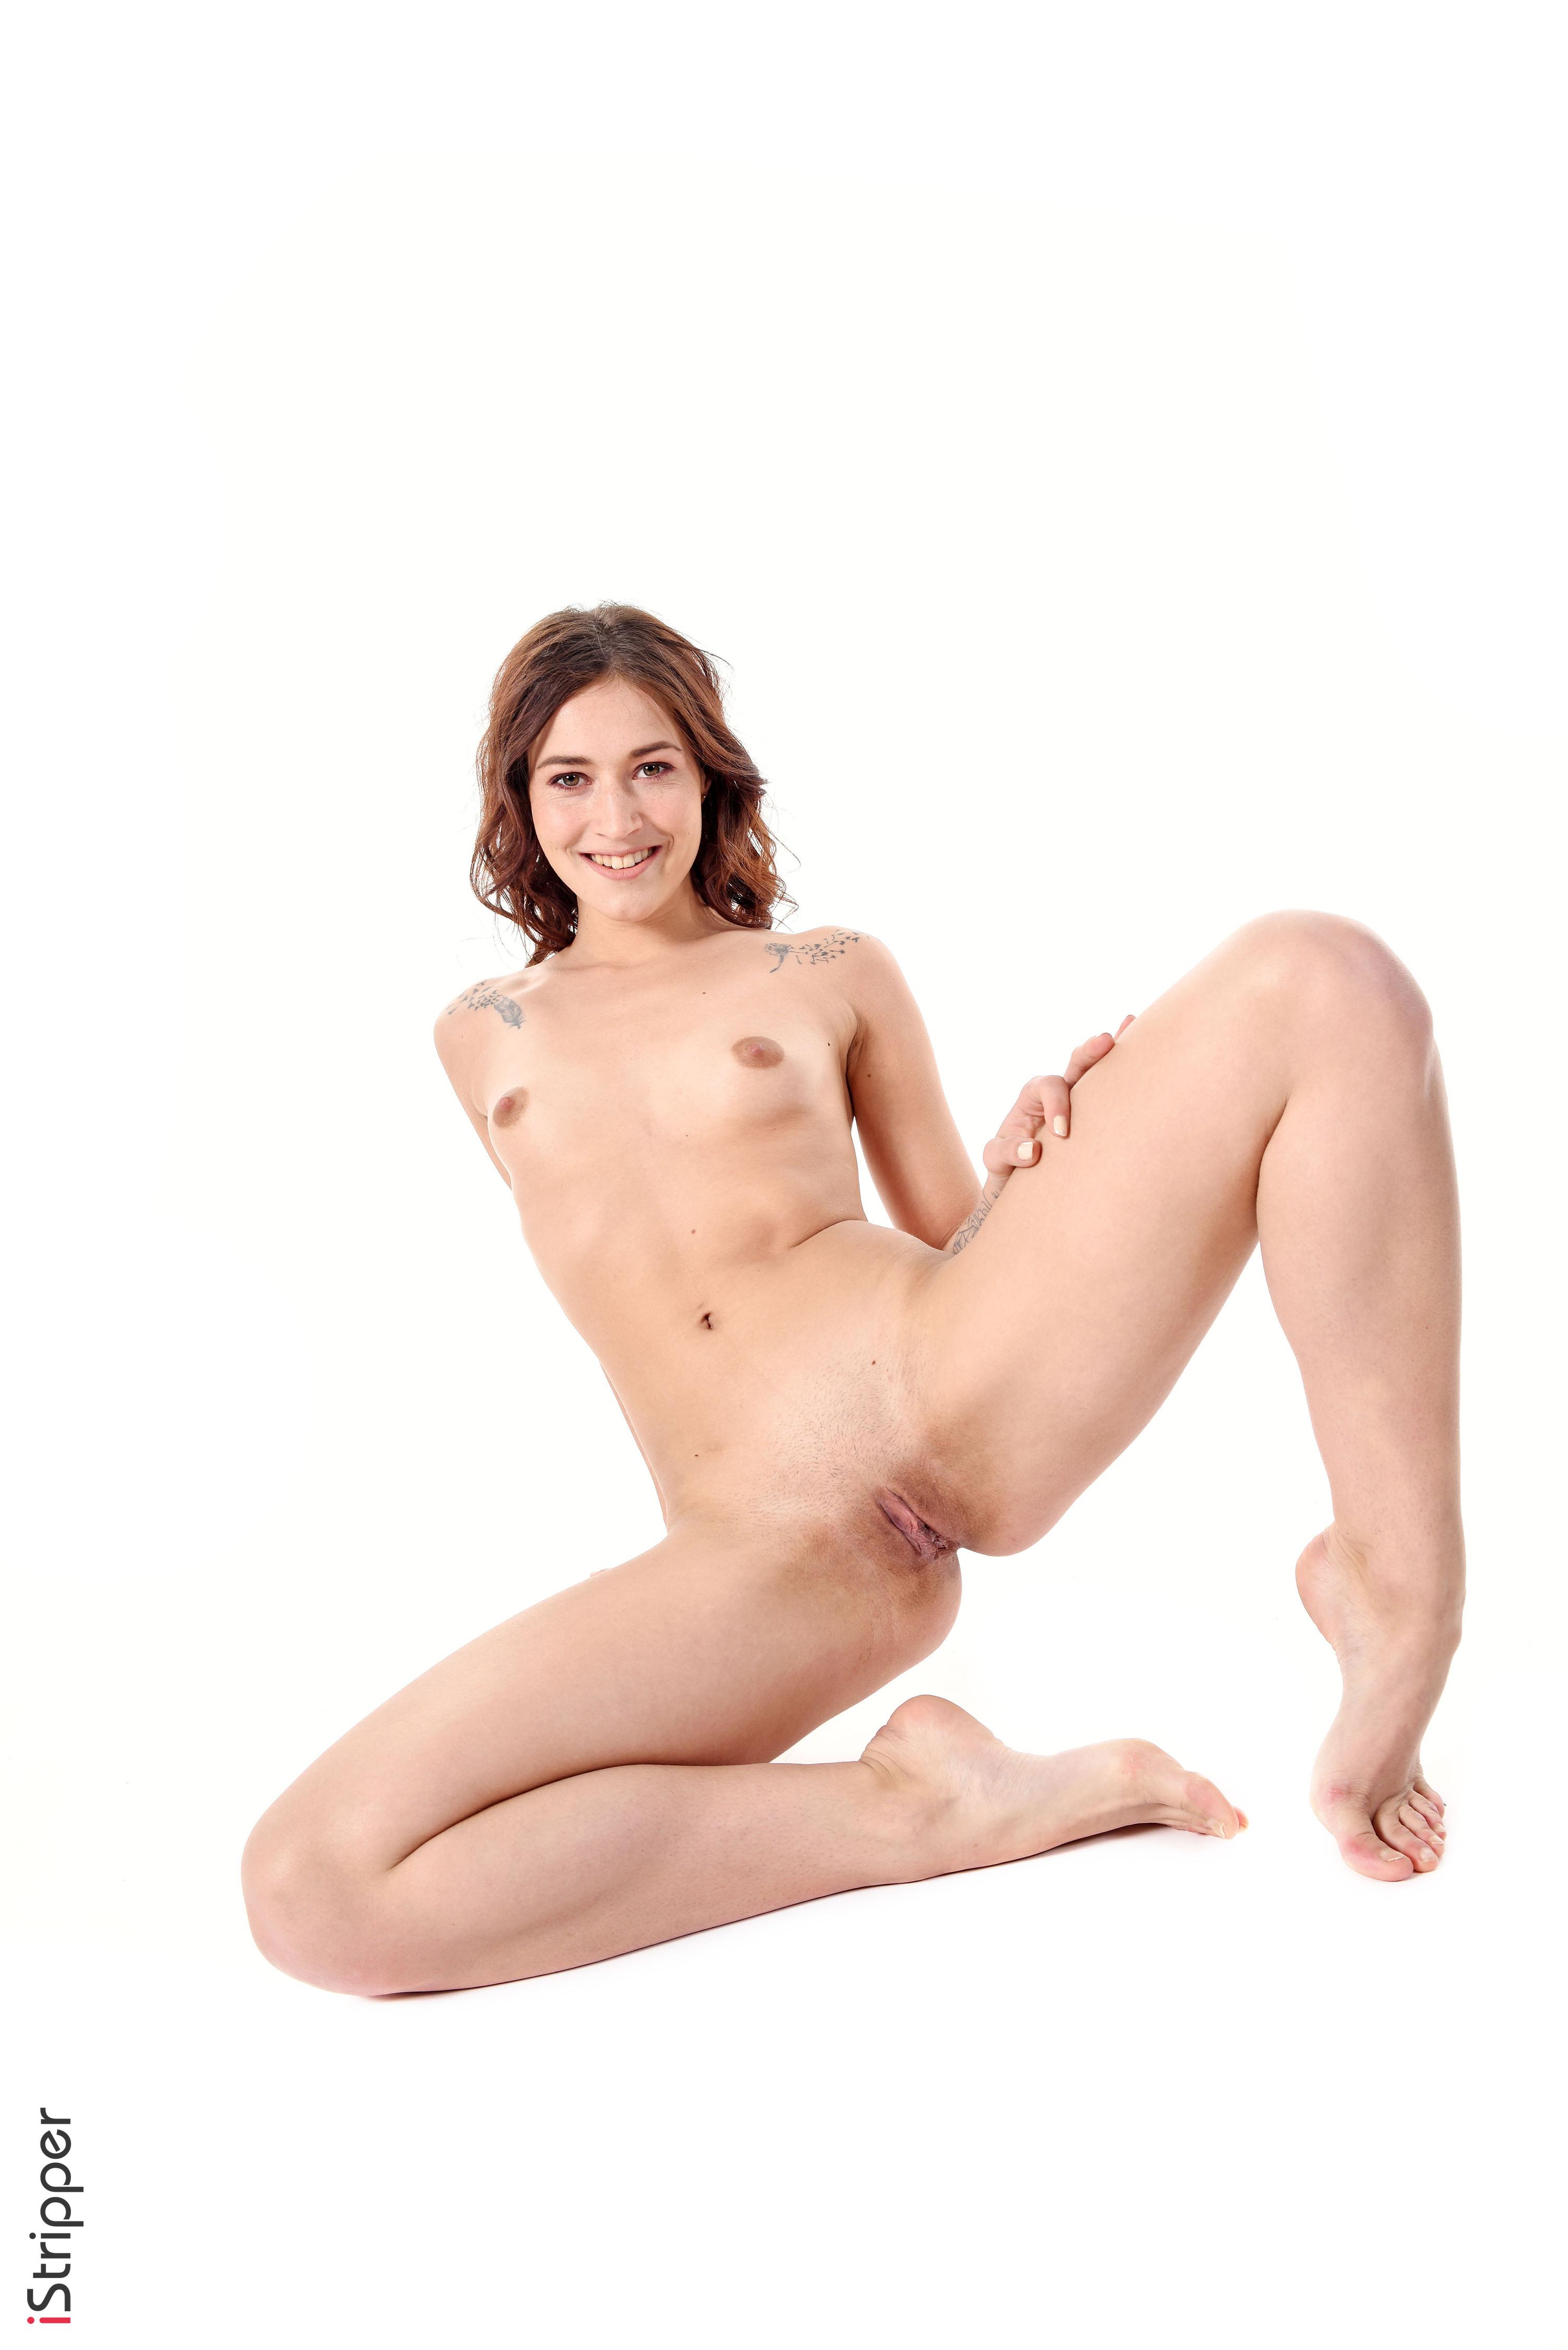 free nude women wallpapers